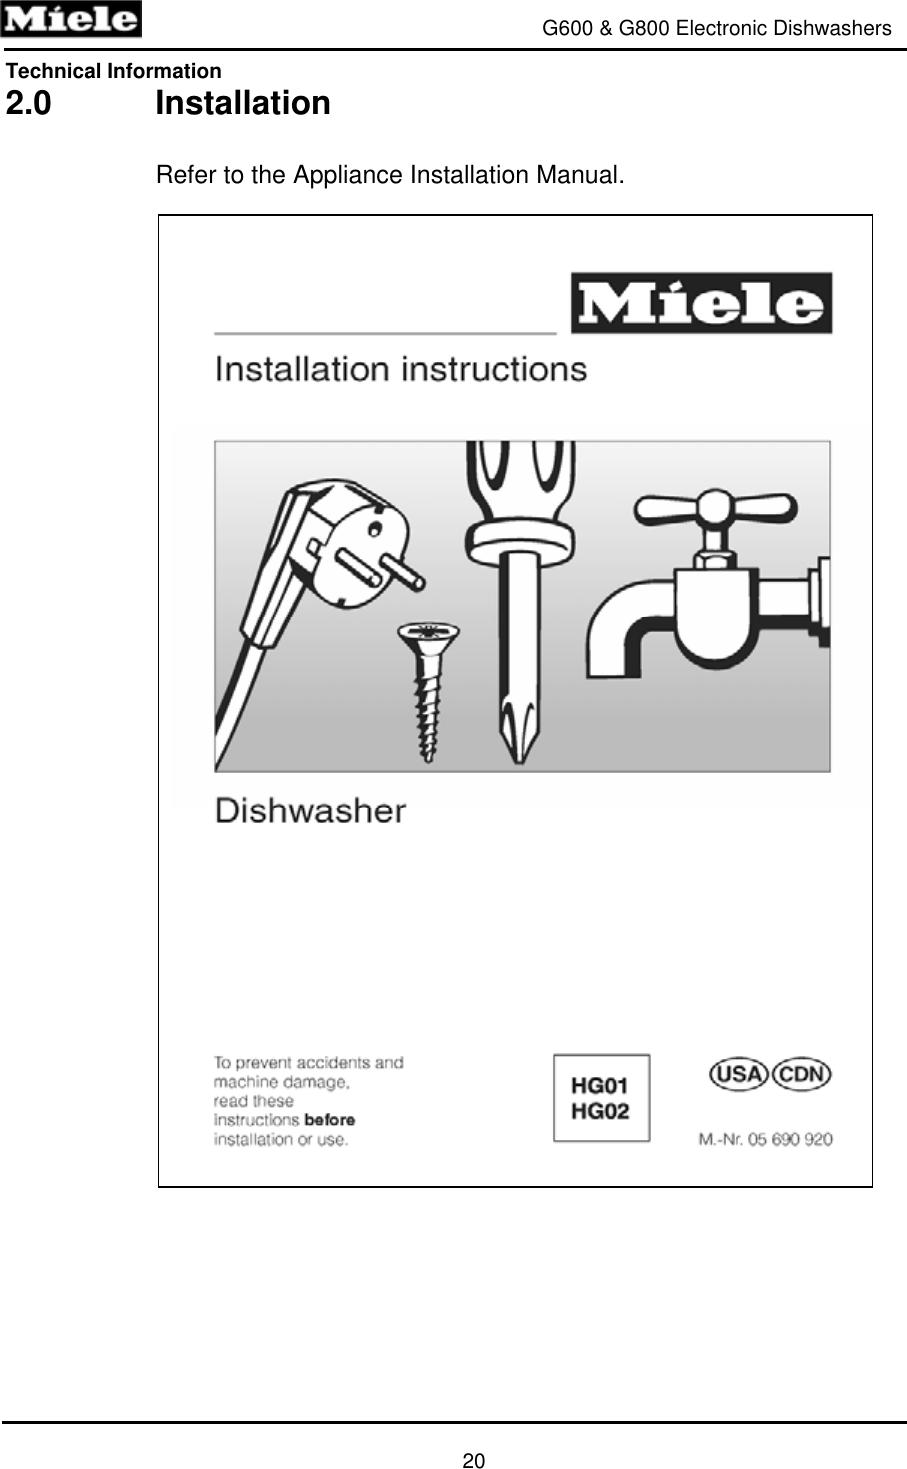 Miele Dishwasher G600 Users Manual 1